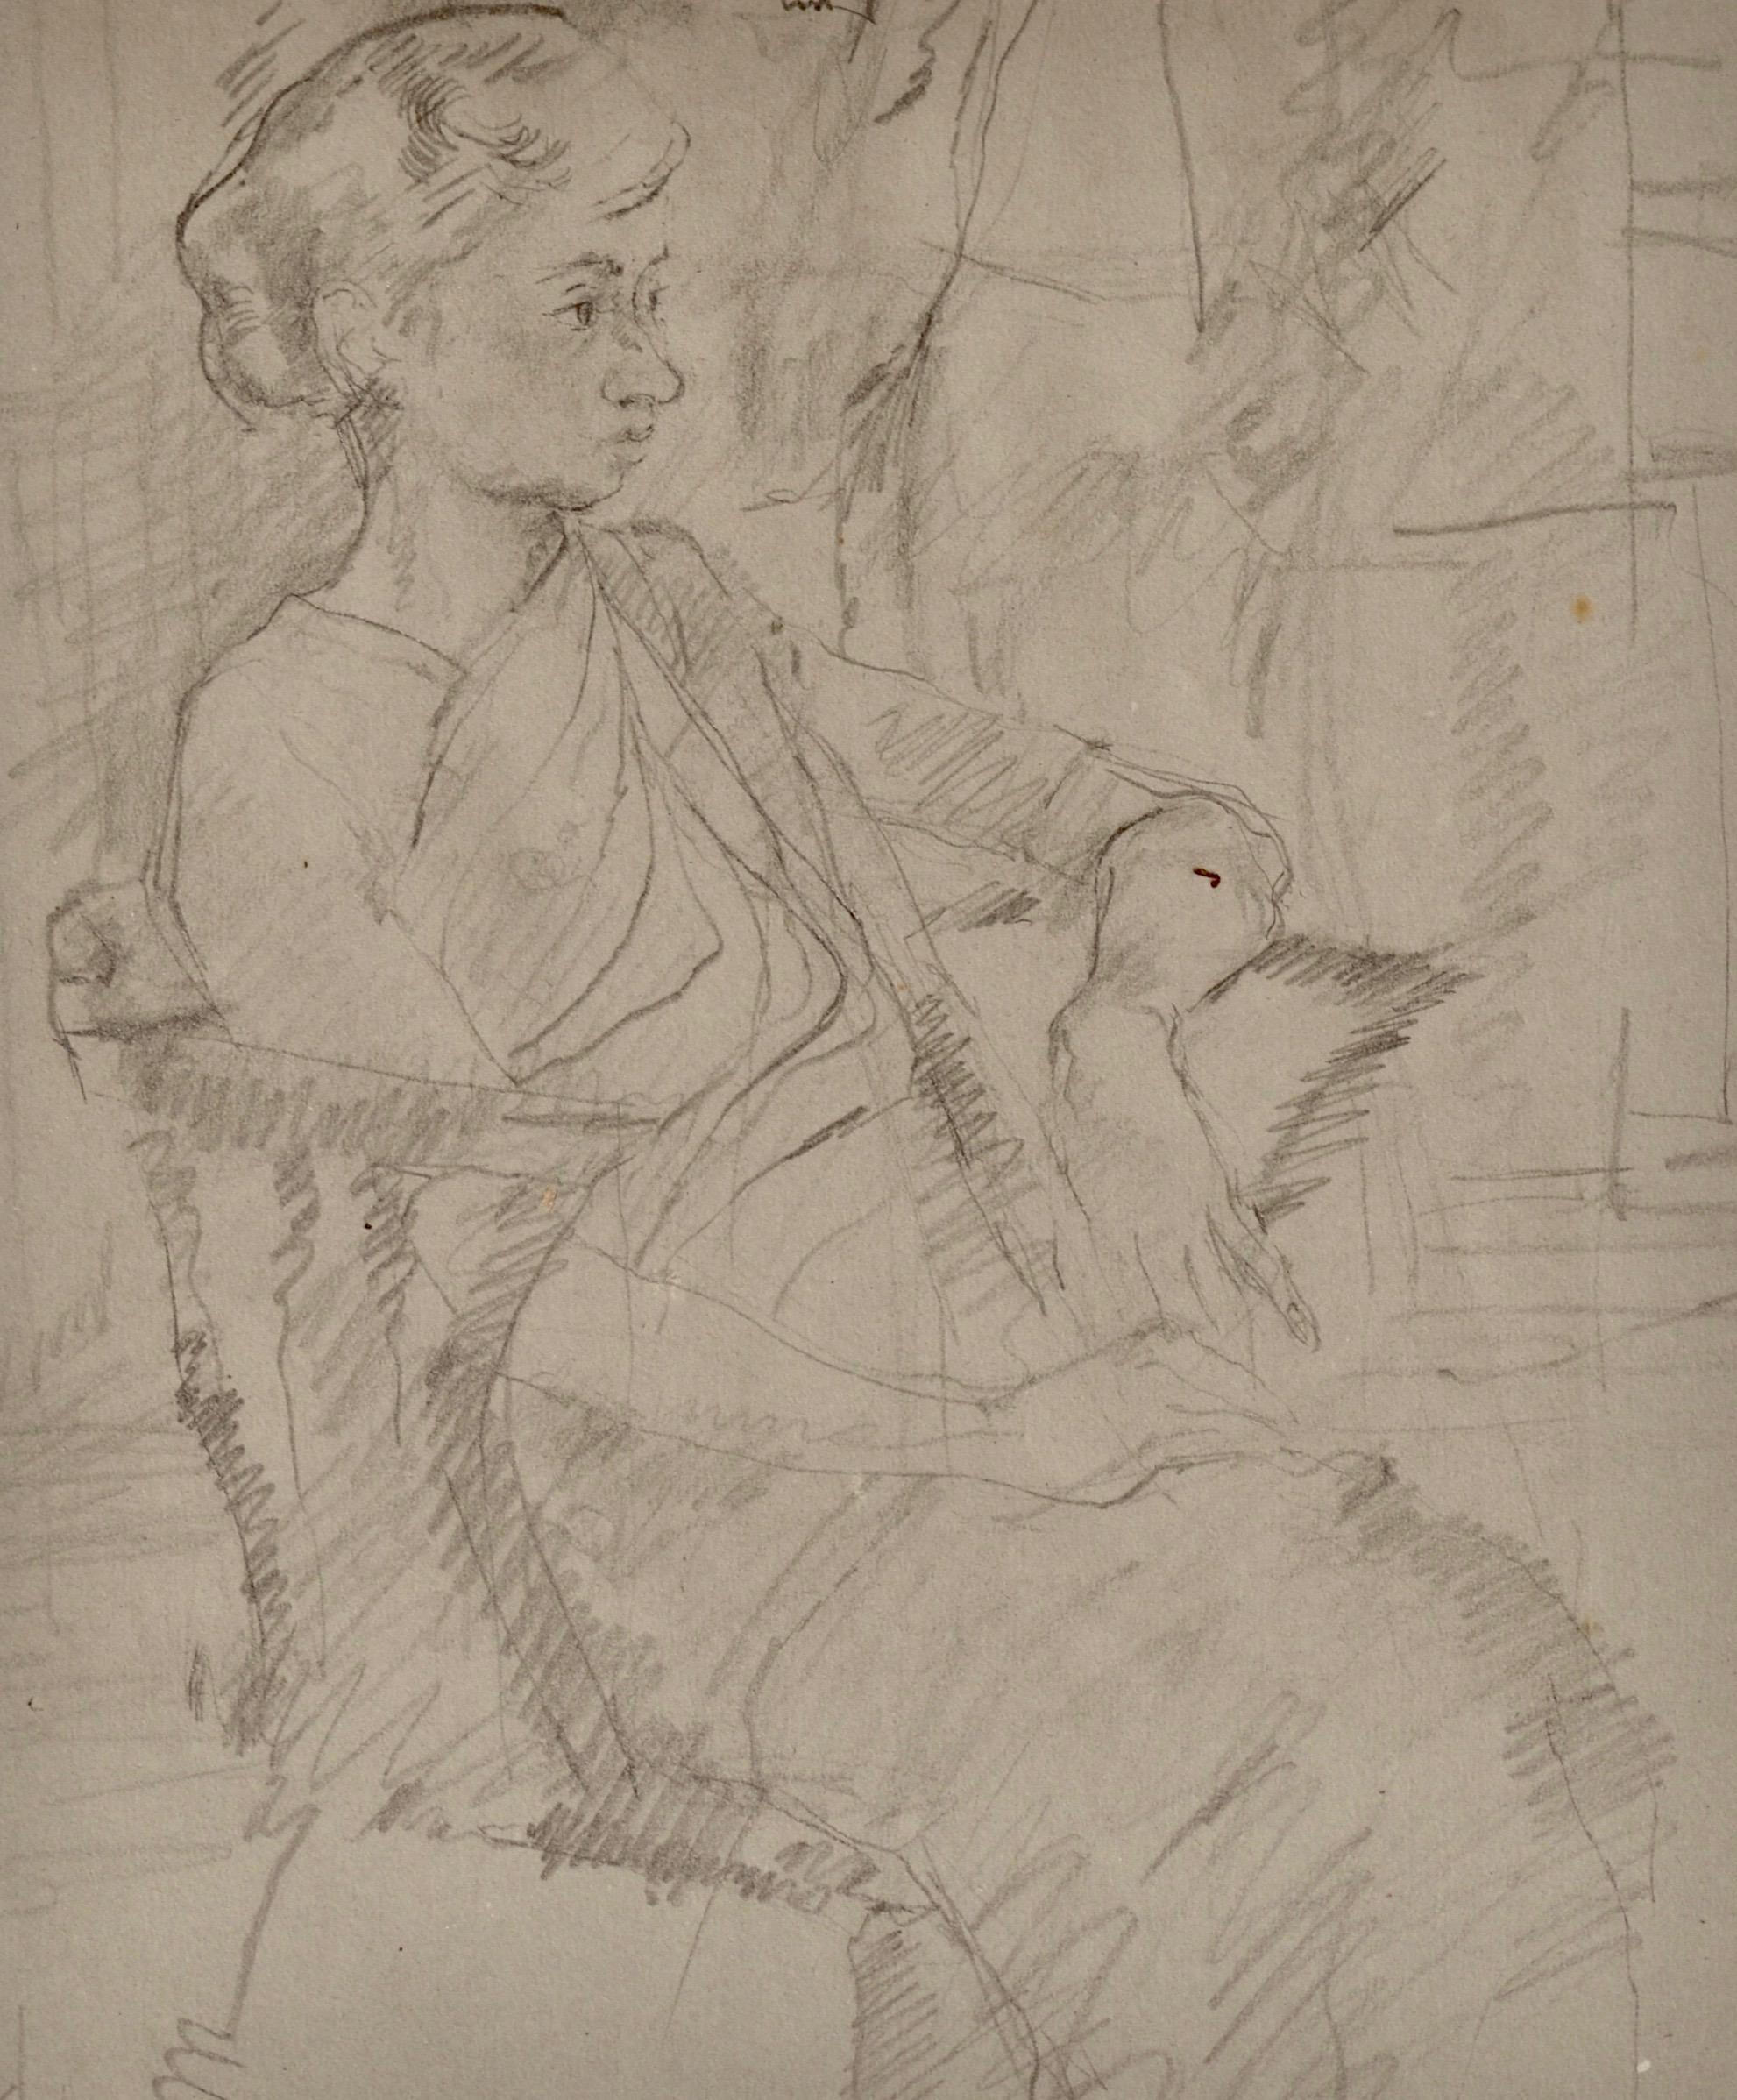 Girl in a Sari - 20th Century pencil drawing by Carolyn Sergeant